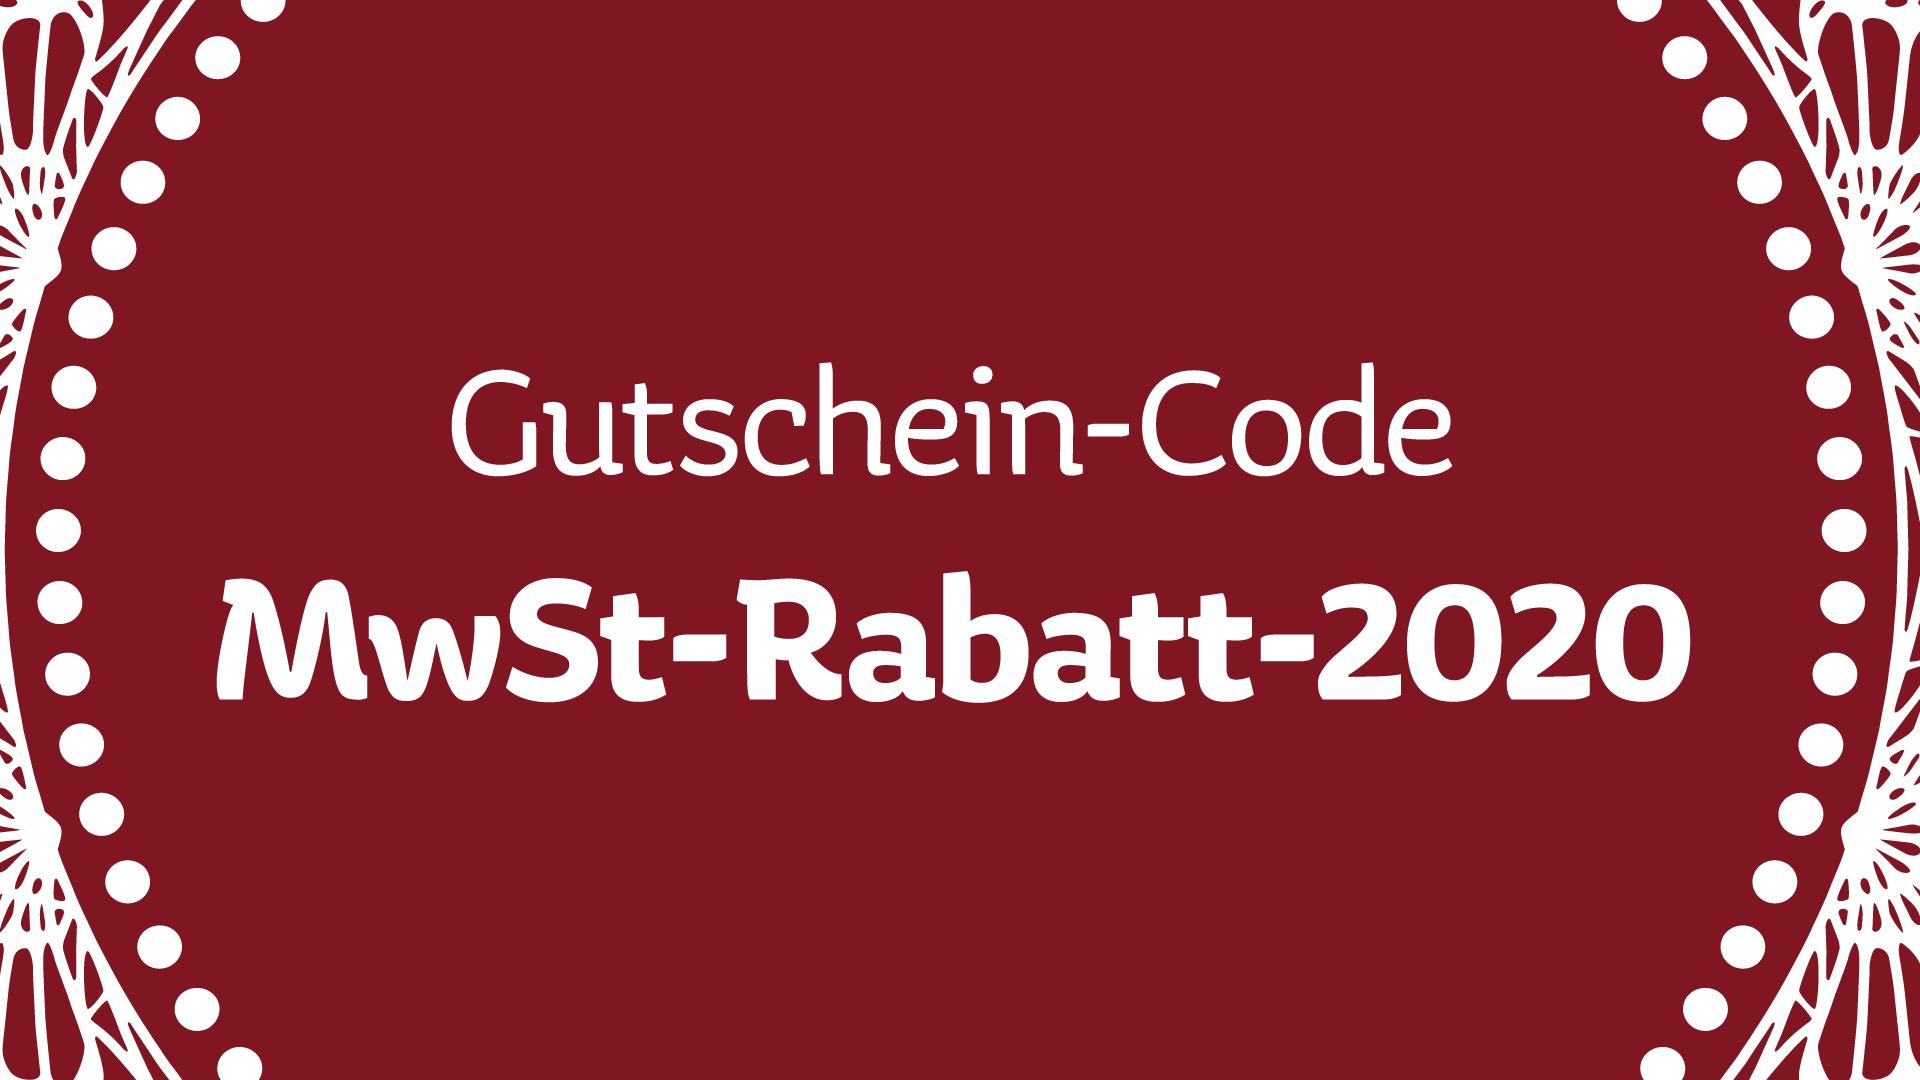 MwSt-Rabatt 3%